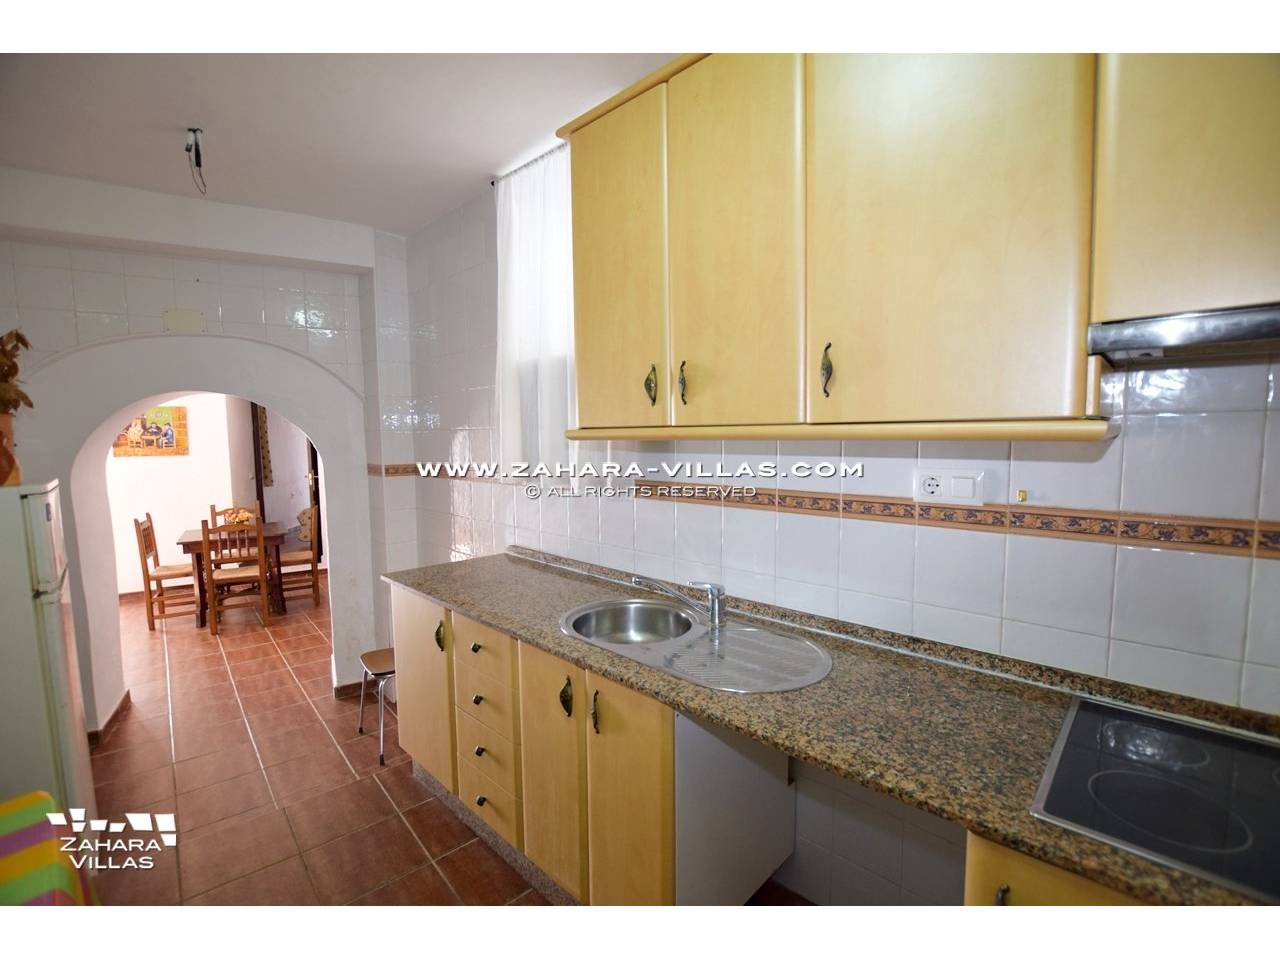 Imagen 16 de House, Apartment and Plot to build in the historic center of Vejer de la Frontera